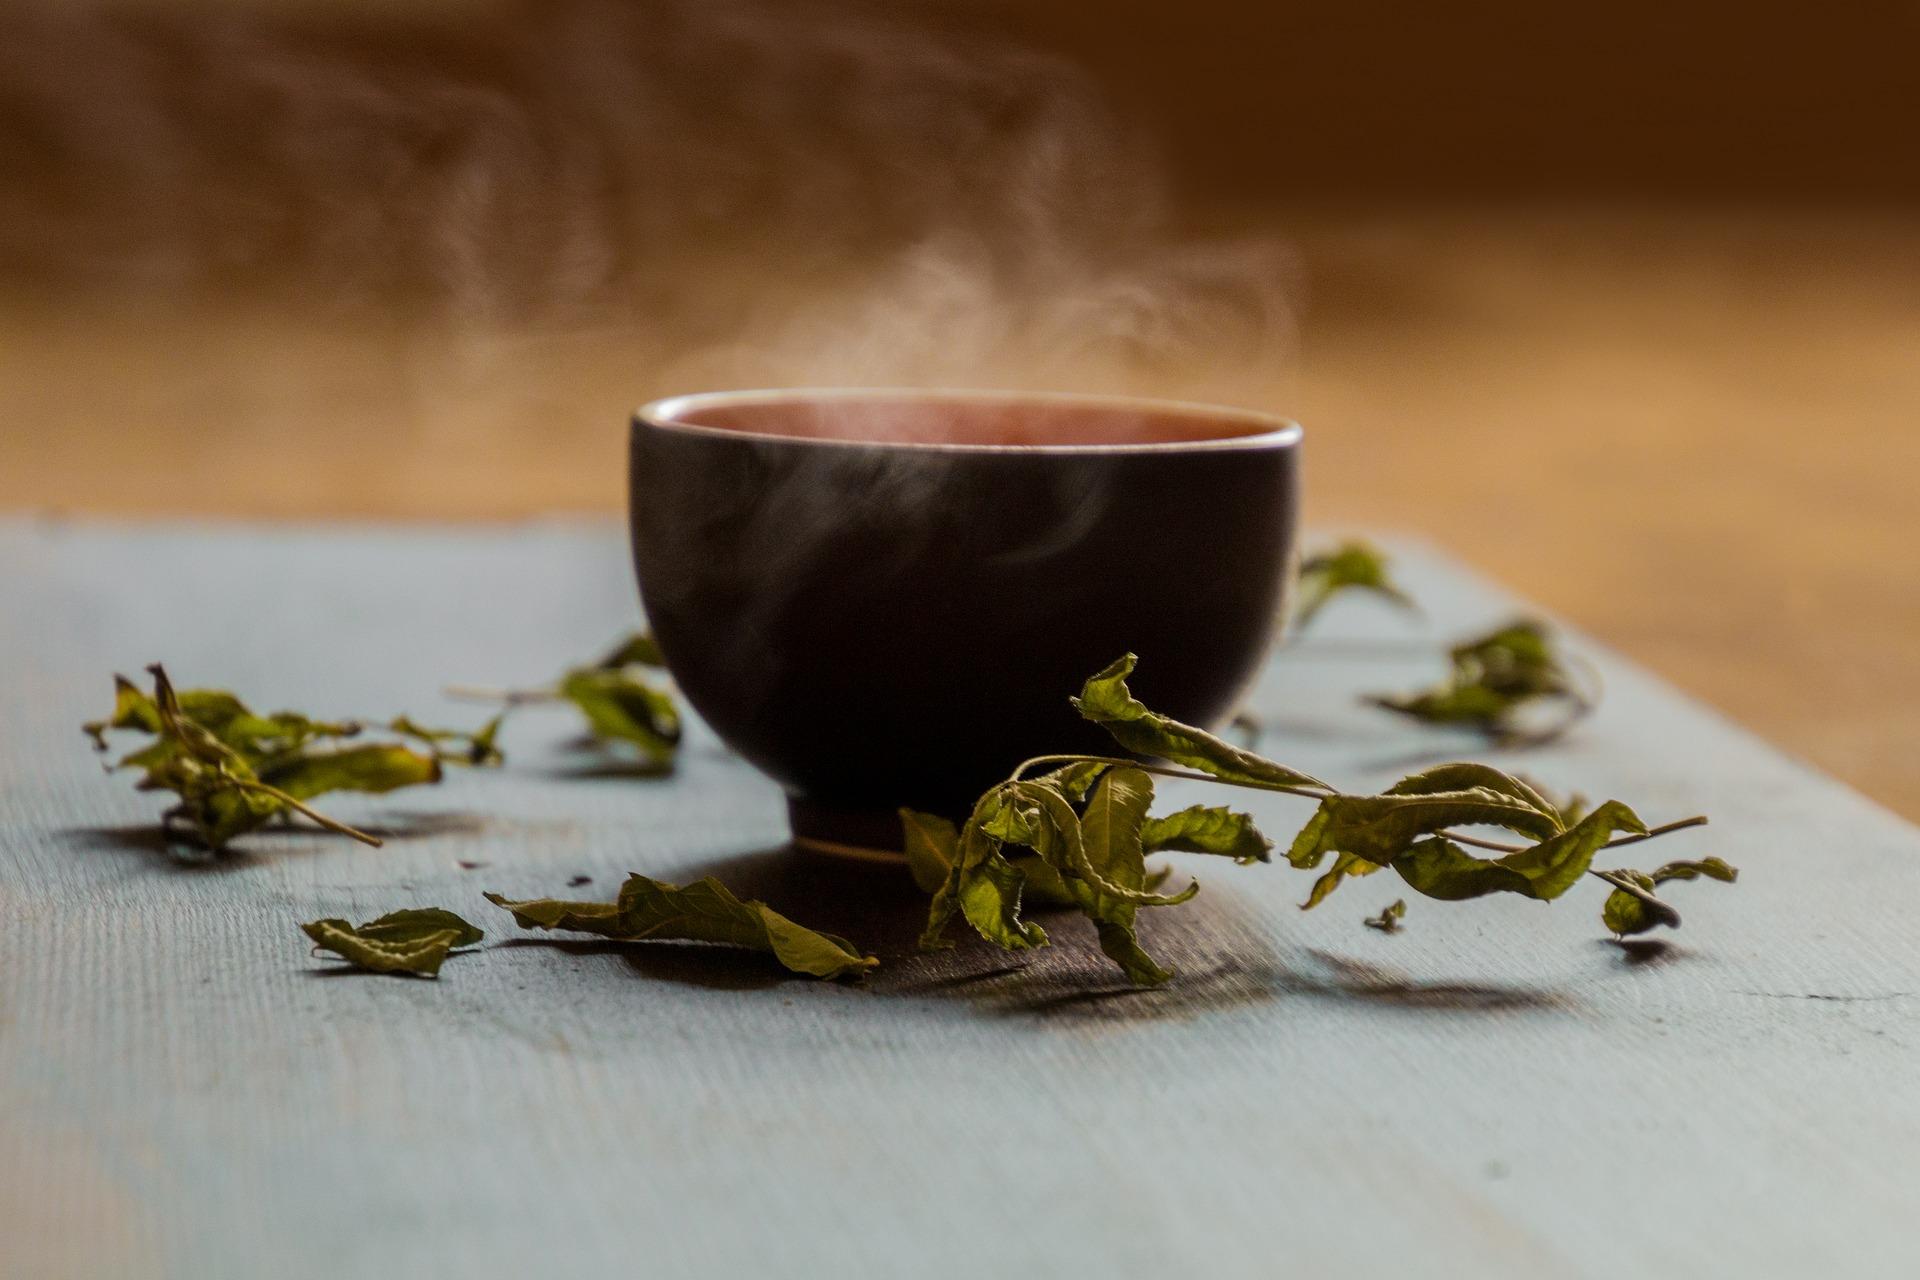 Top Antioxidant Containing Foods - green tea